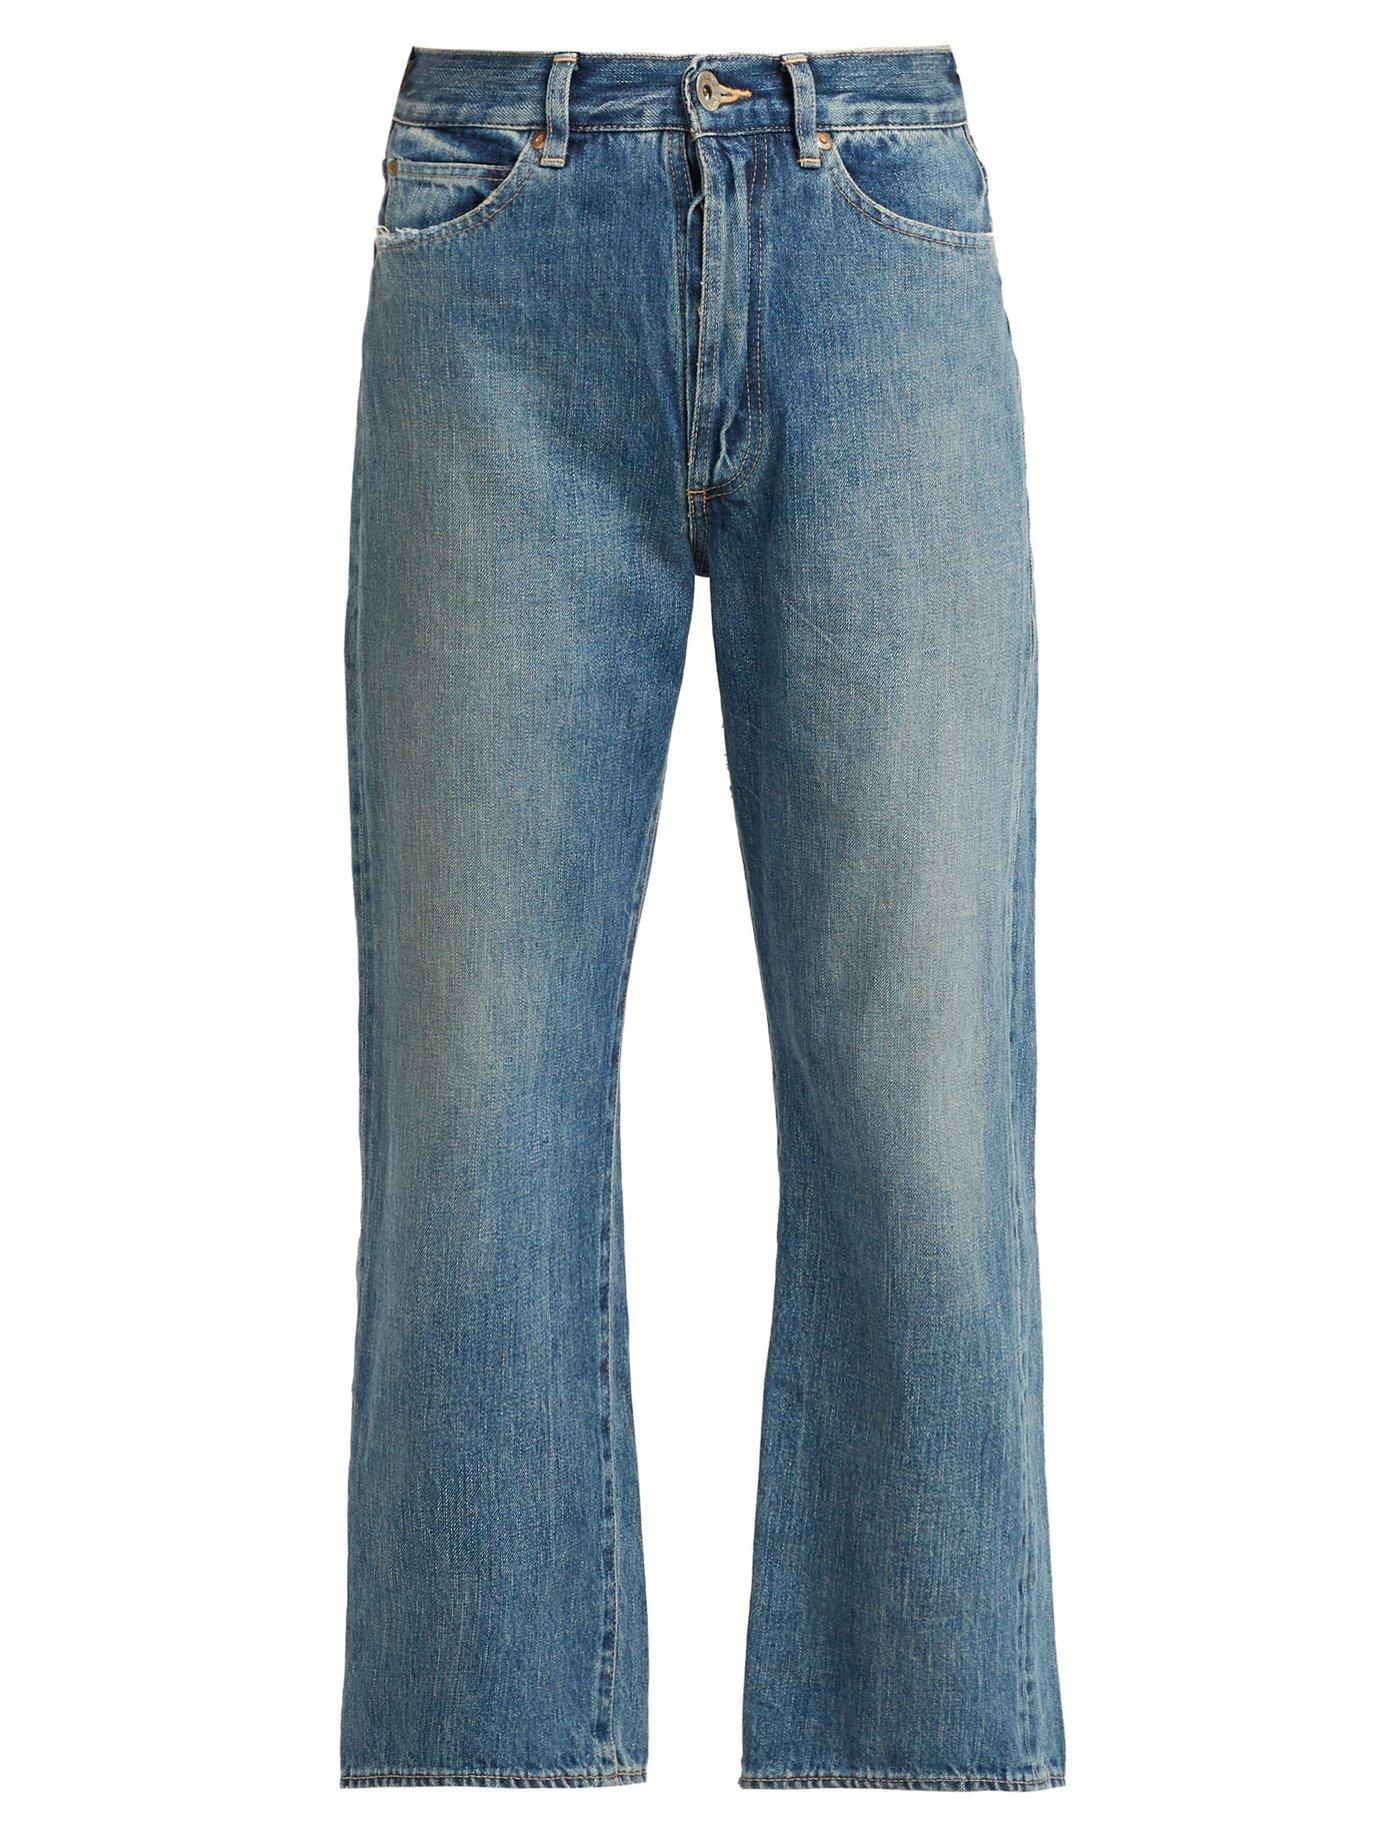 Chimala Monroe Selvedge-denim Jeans